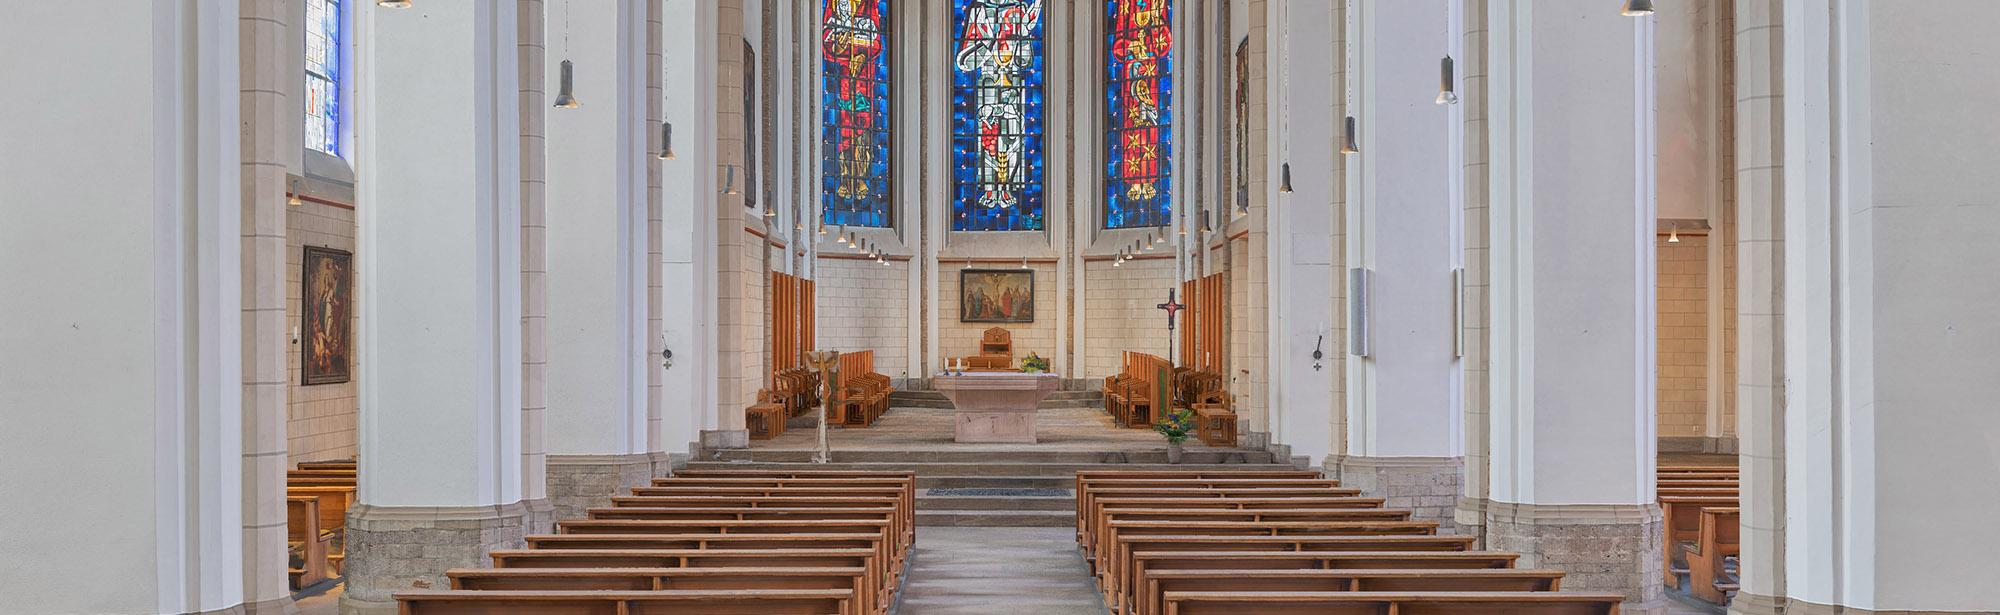 StJohann Kirche